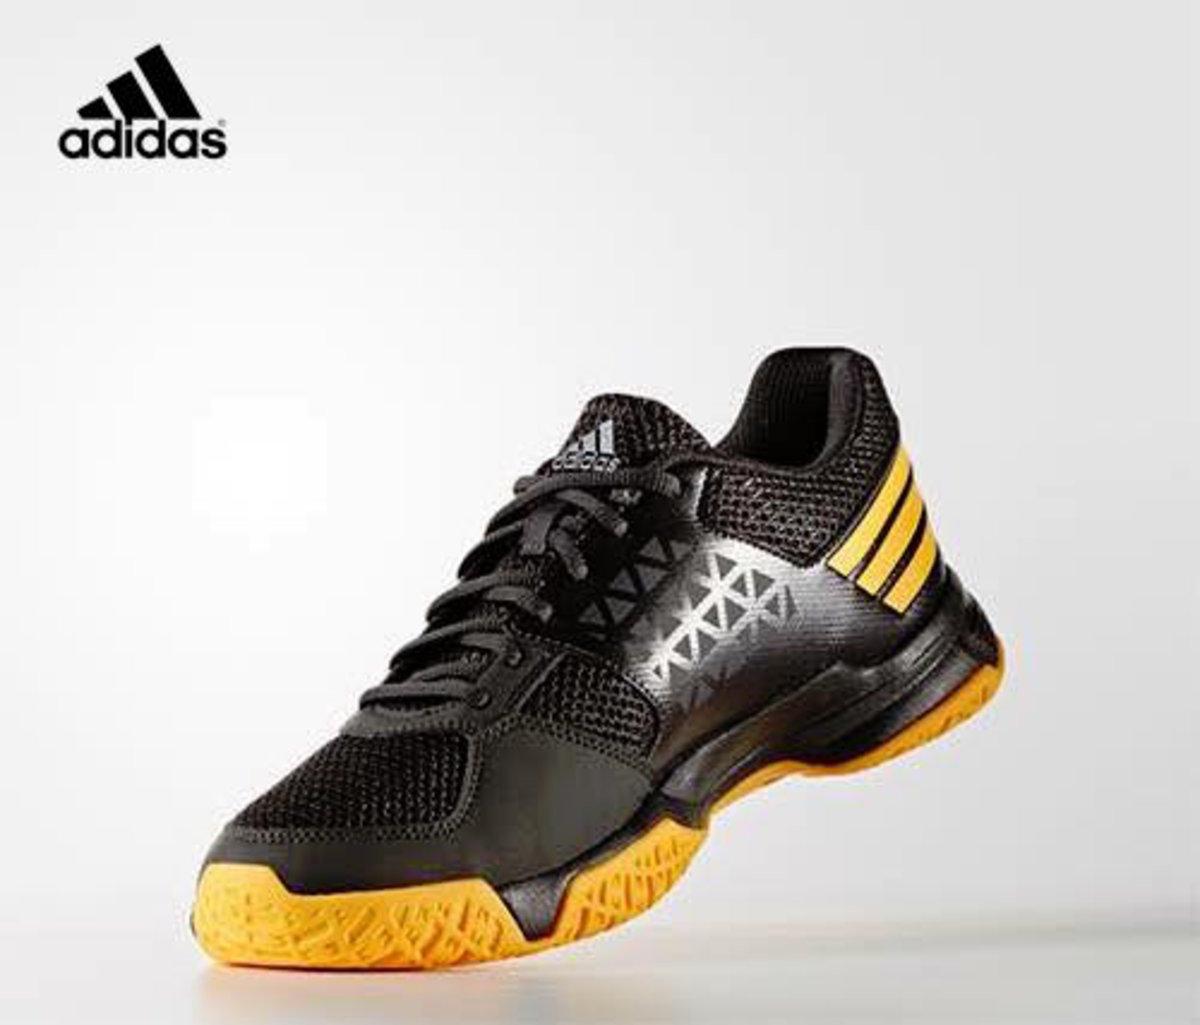 Adidas   ADIZERO F4-BB4835 Men's Badminton Shoes   HKTVmall Online Shopping